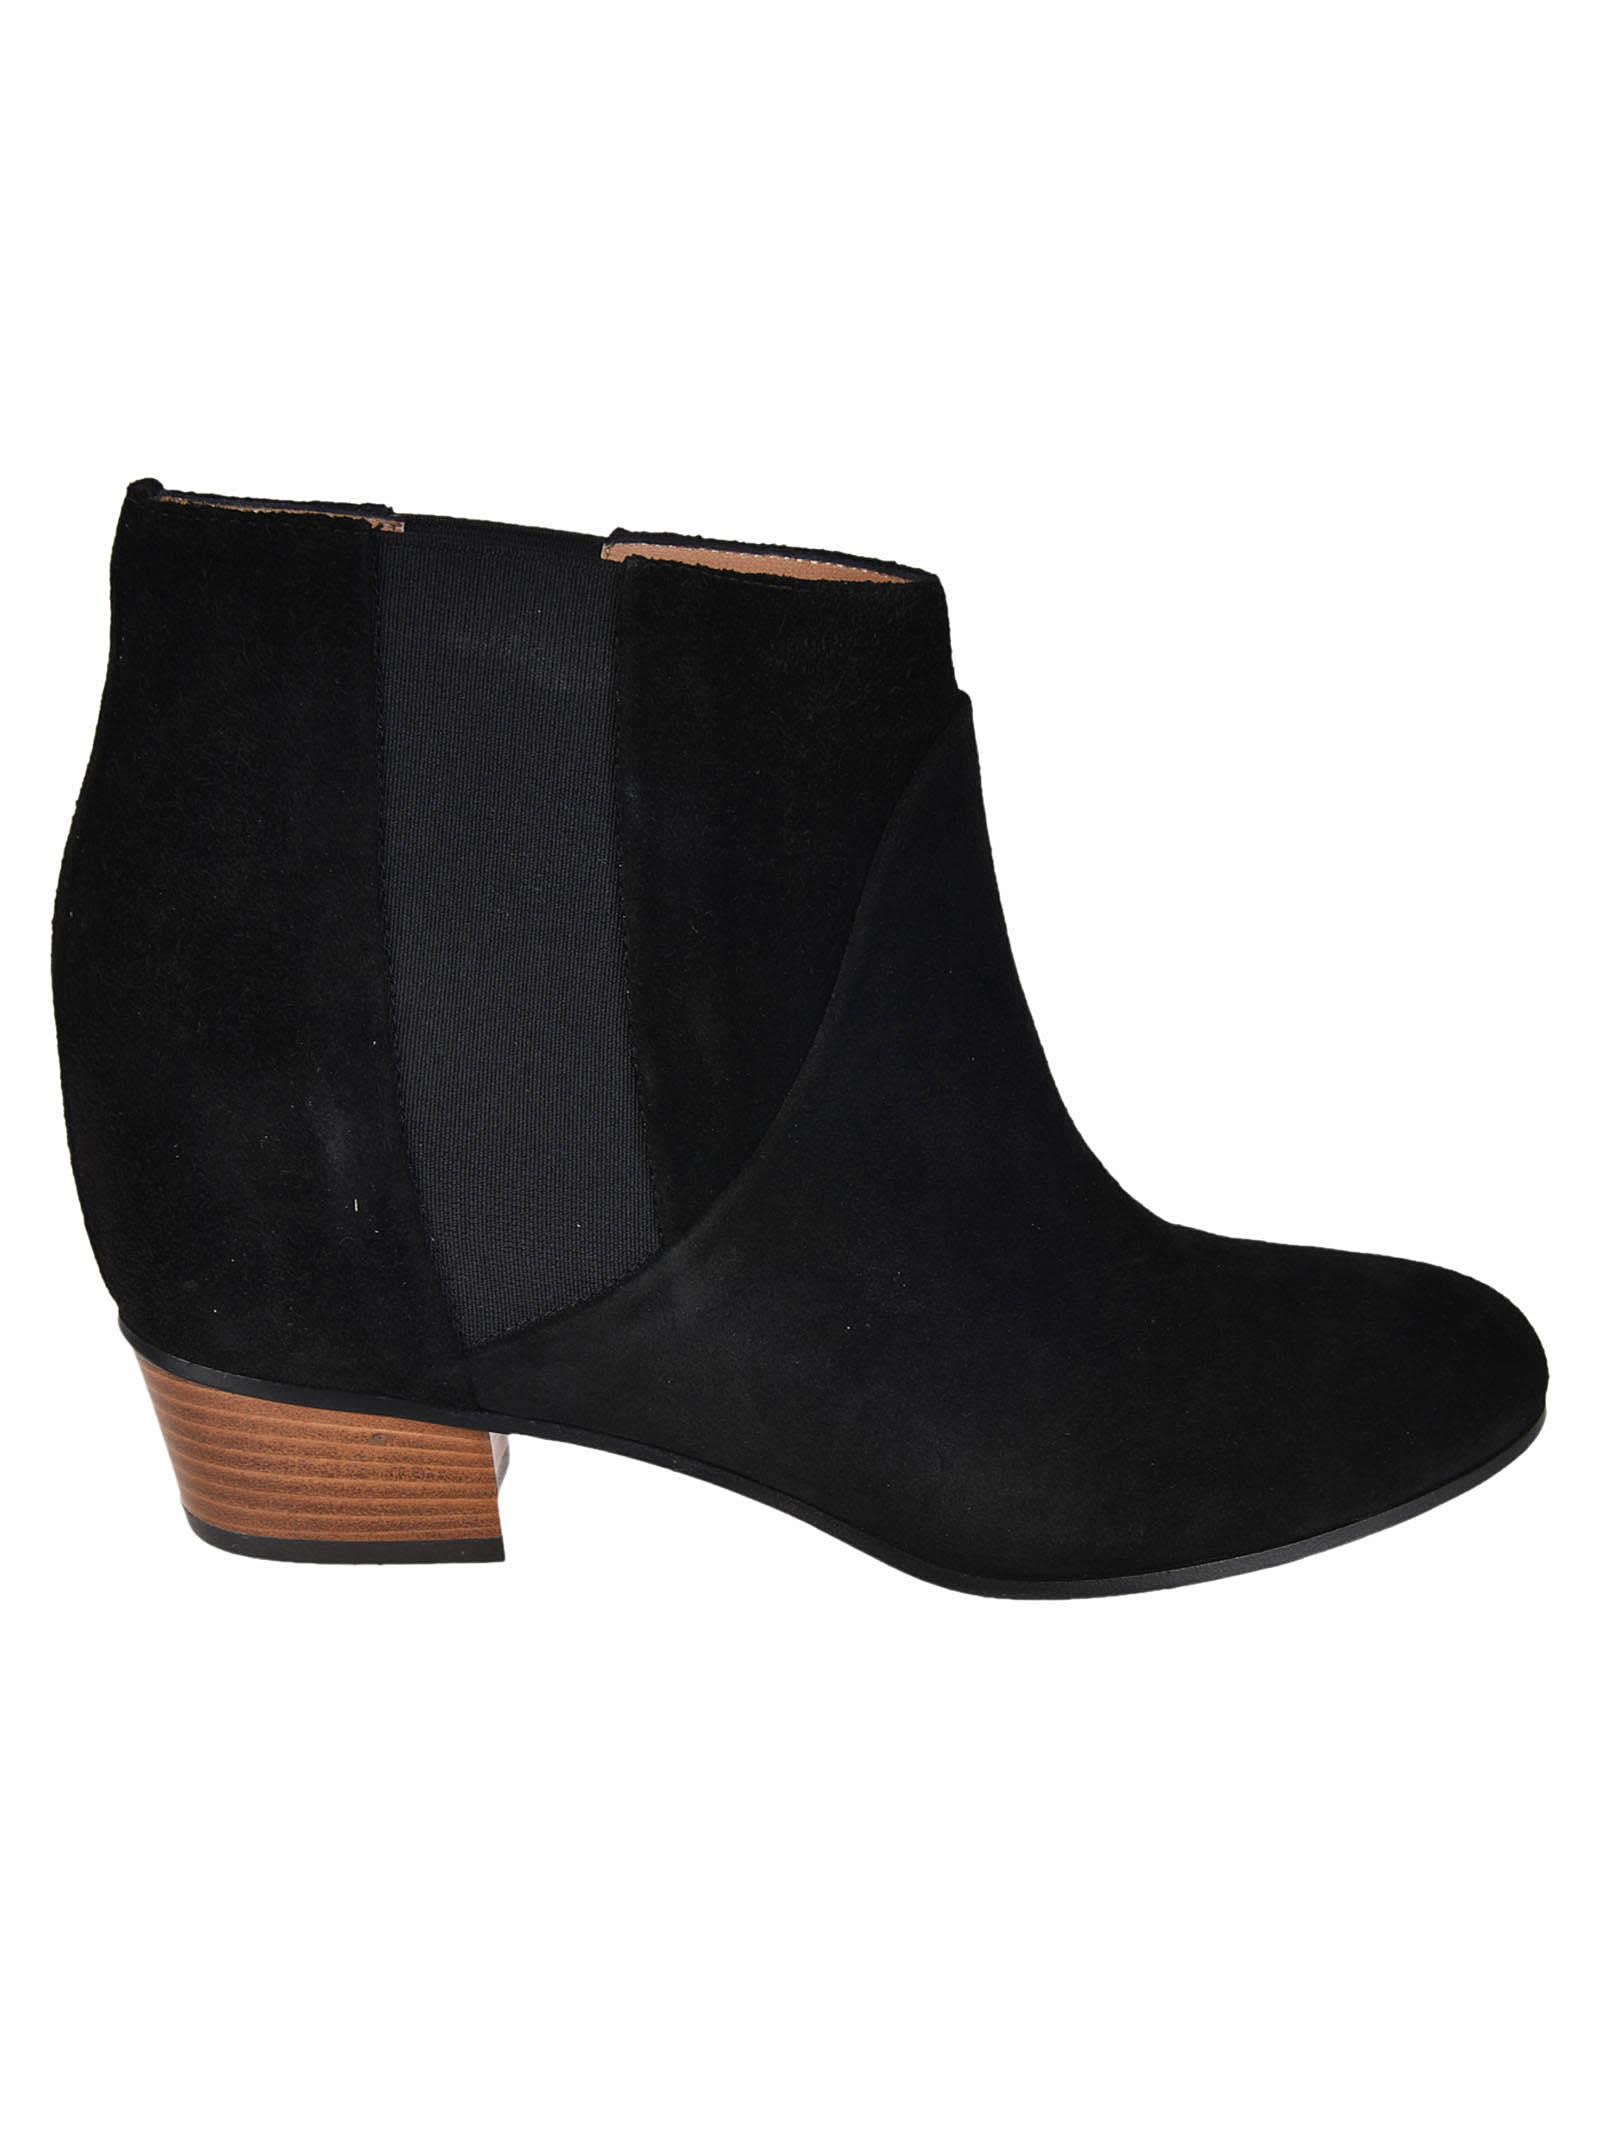 Golden Goose Dana Boots